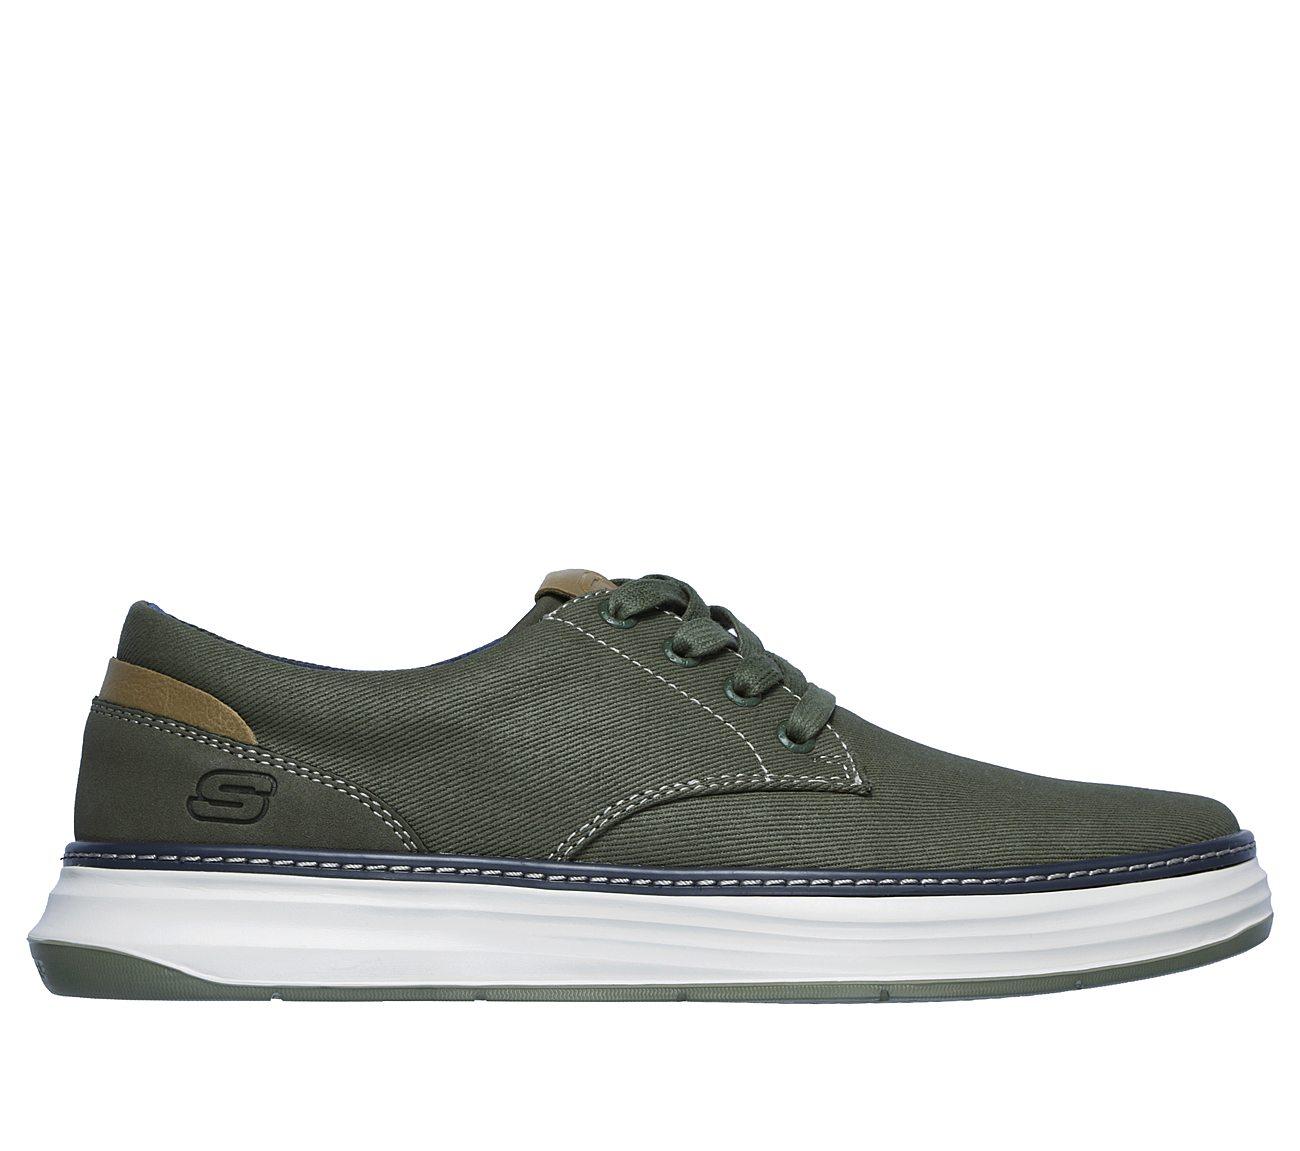 skechers slip on canvas shoes